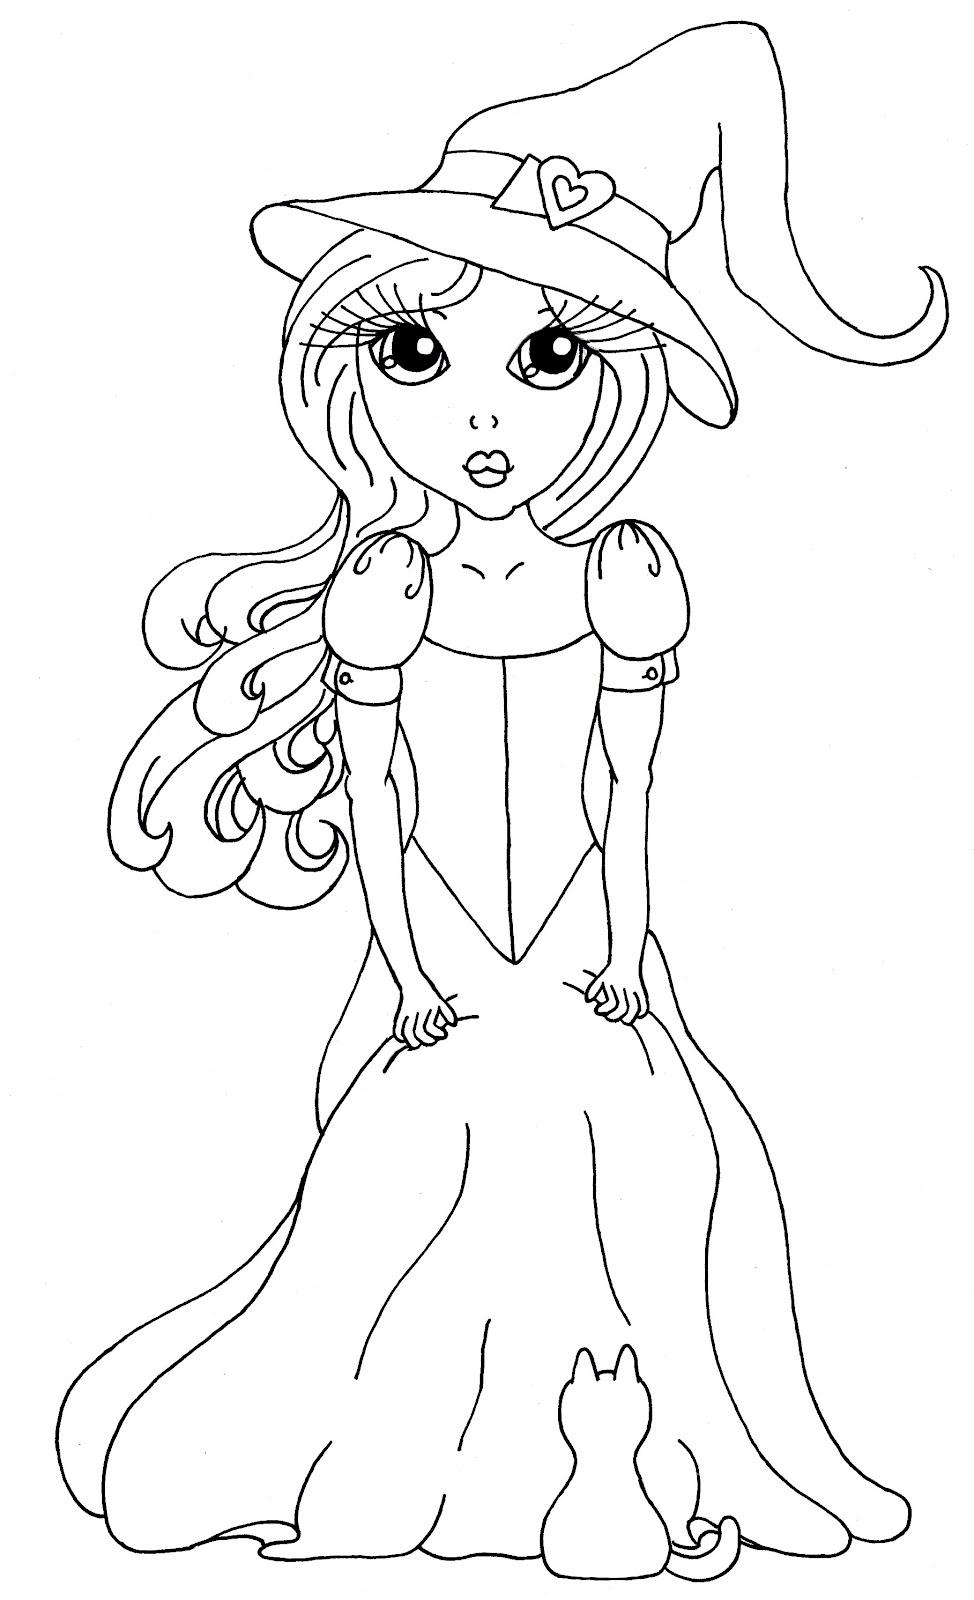 Cuddlebug Cuties: Josephine the Stylish Witch